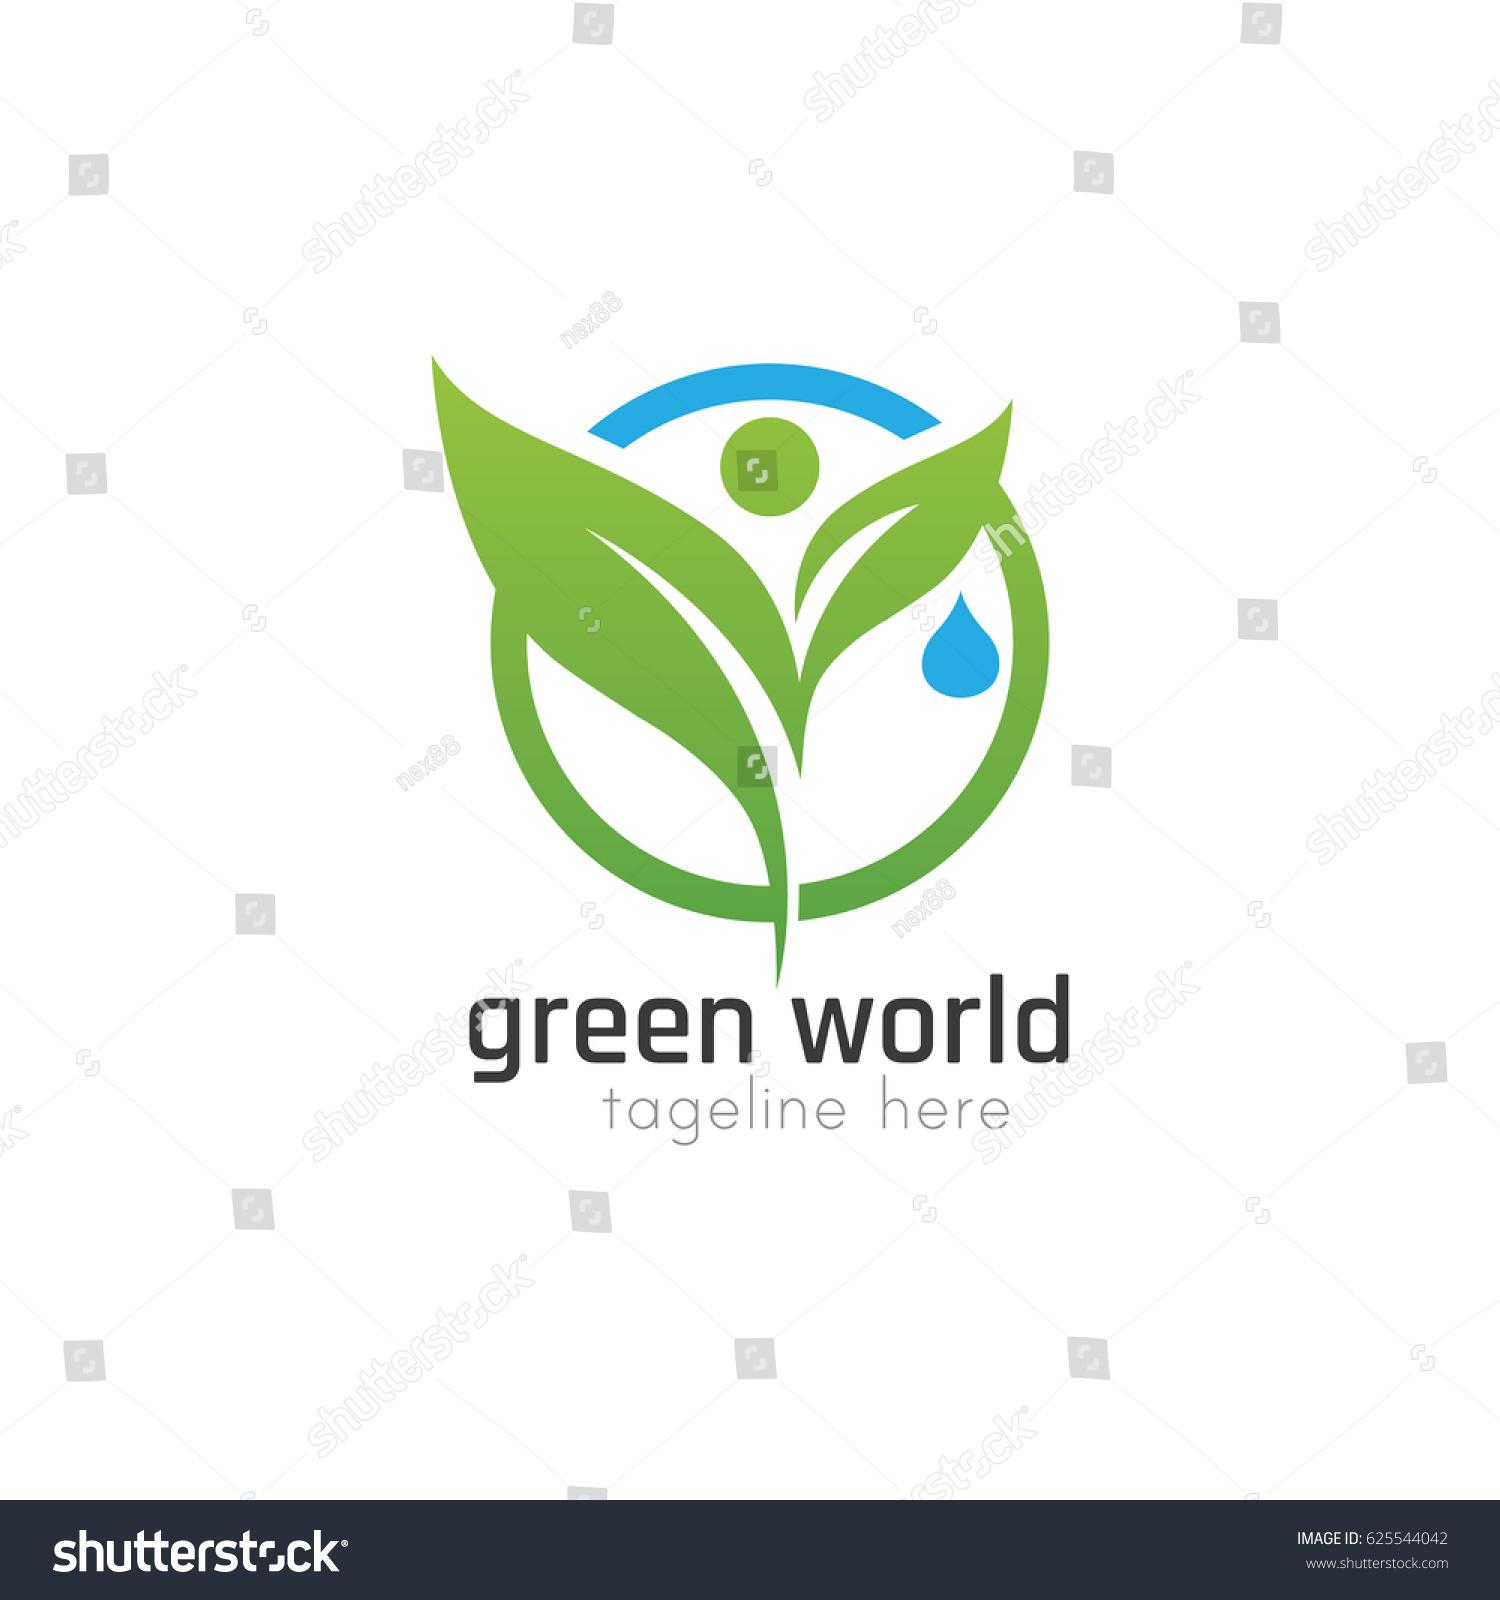 Vector Illustration Green World Logo Design Stock Vector Royalty